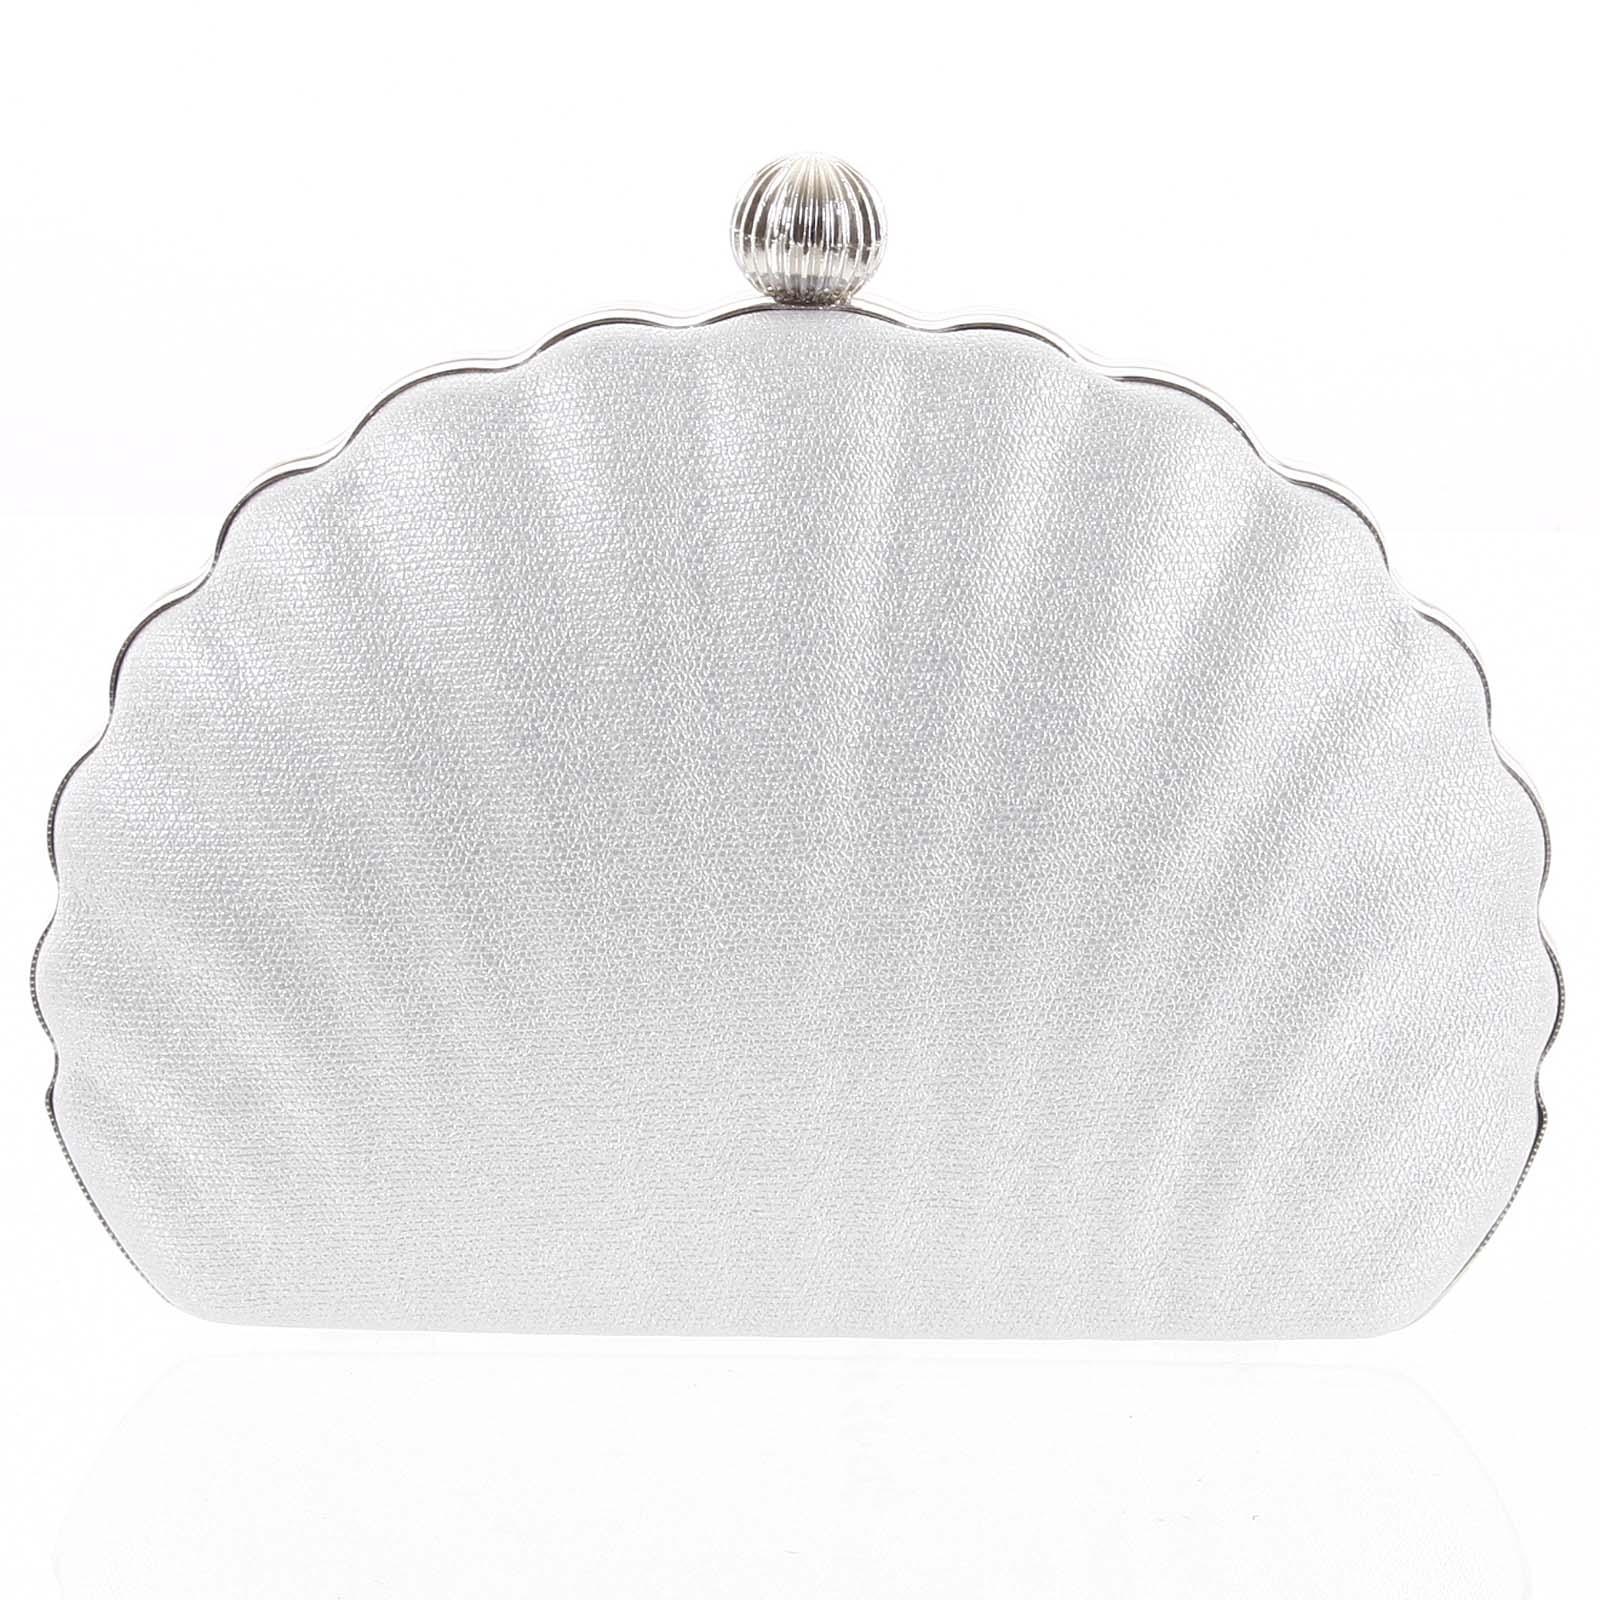 Dámska listová kabelka strieborná - Michelle Moon Seashell